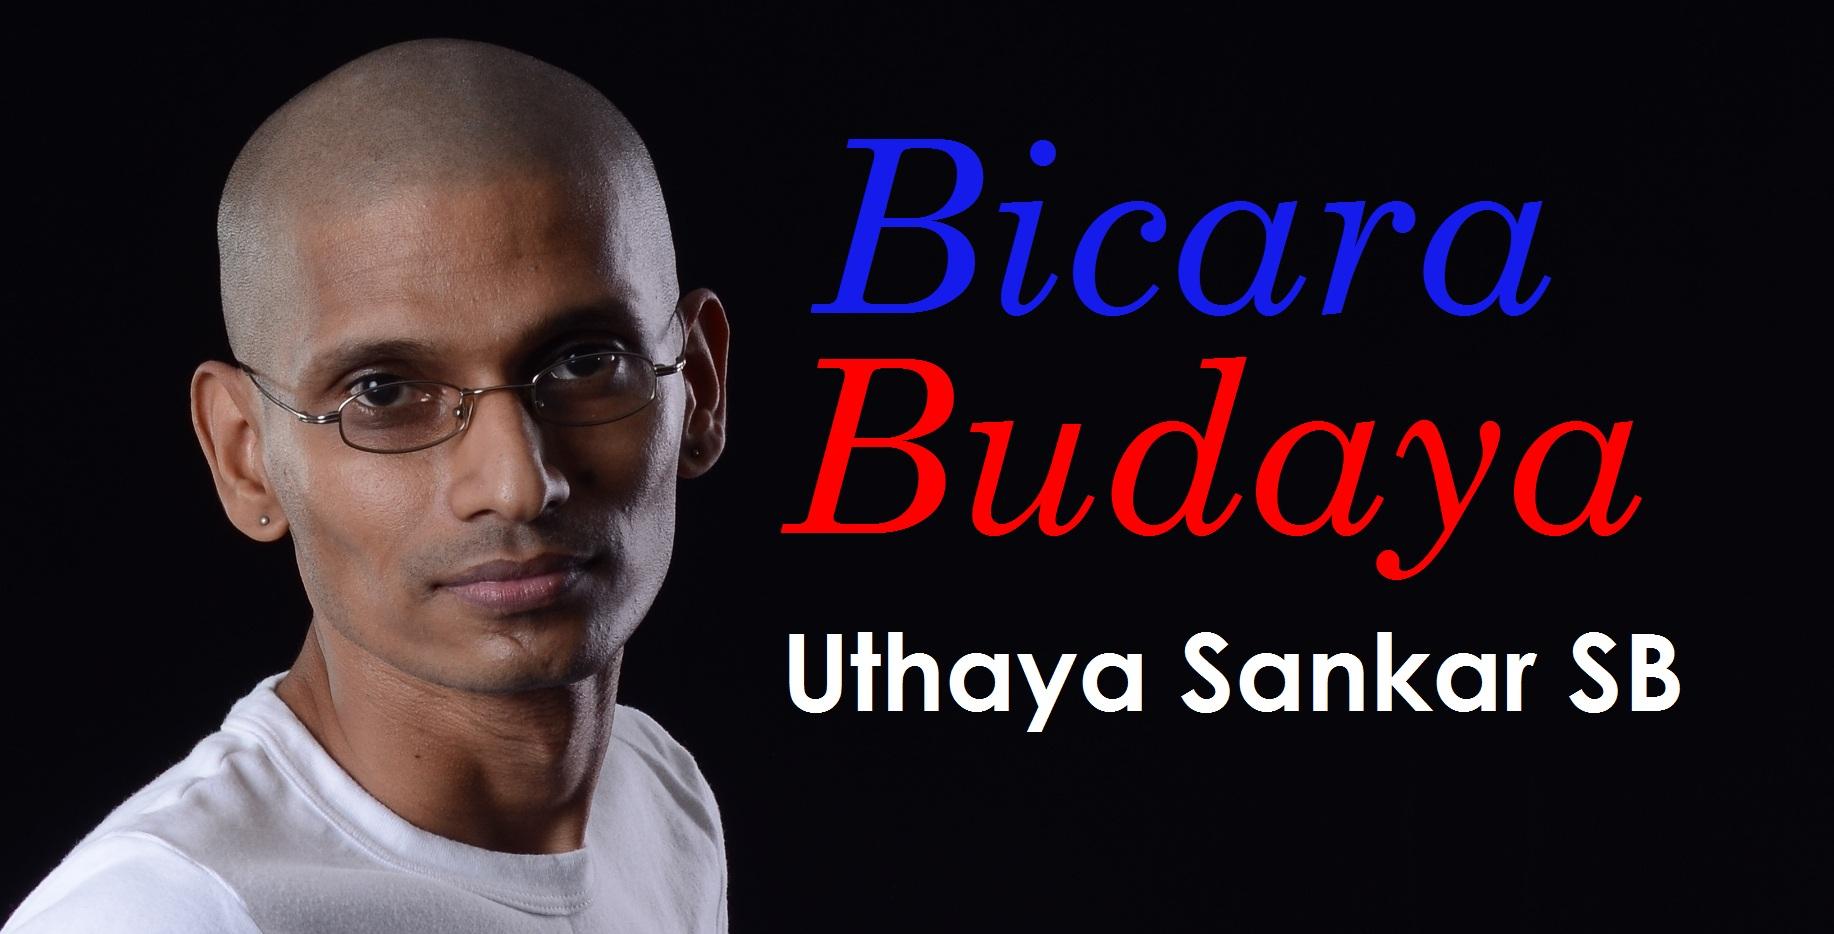 Jom Mapley Oleh Uthaya Sankar SB Roketkinicom